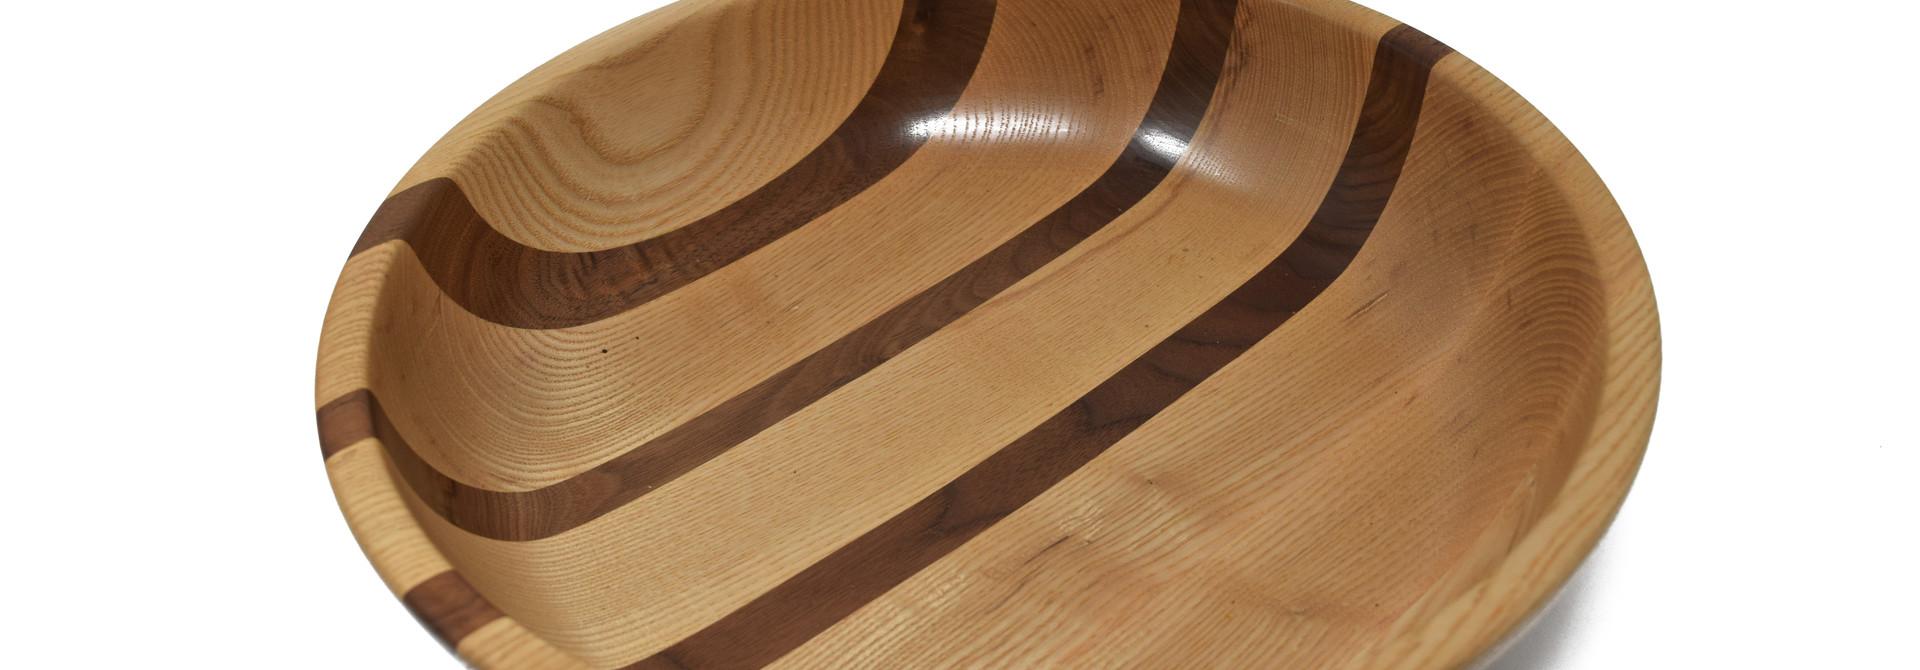 Wood Serving Bowl